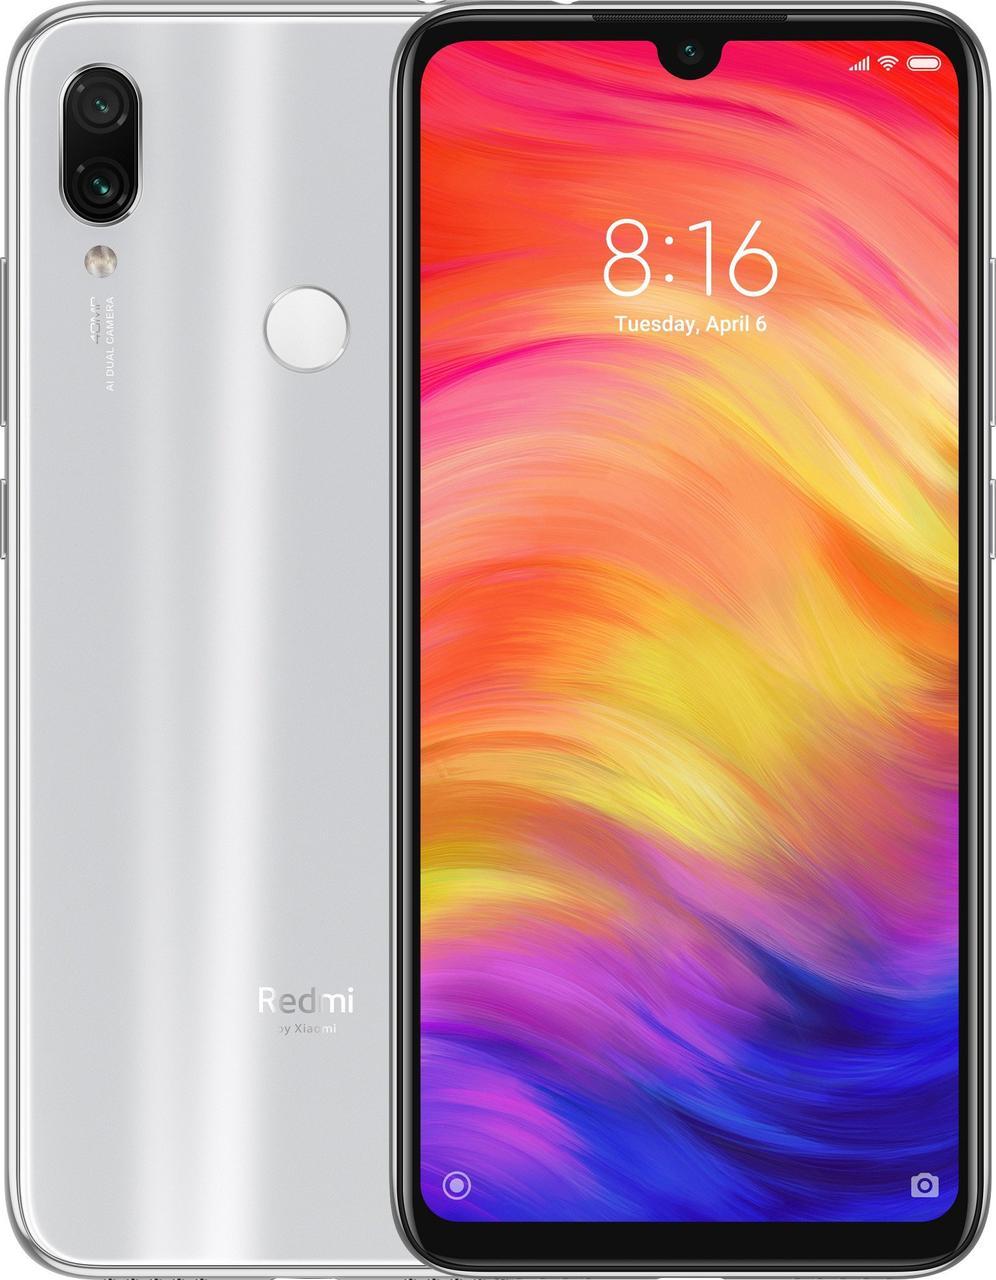 Смартфон Xiaomi Redmi Note 7 3/32Gb (Moonlight White) Global Version